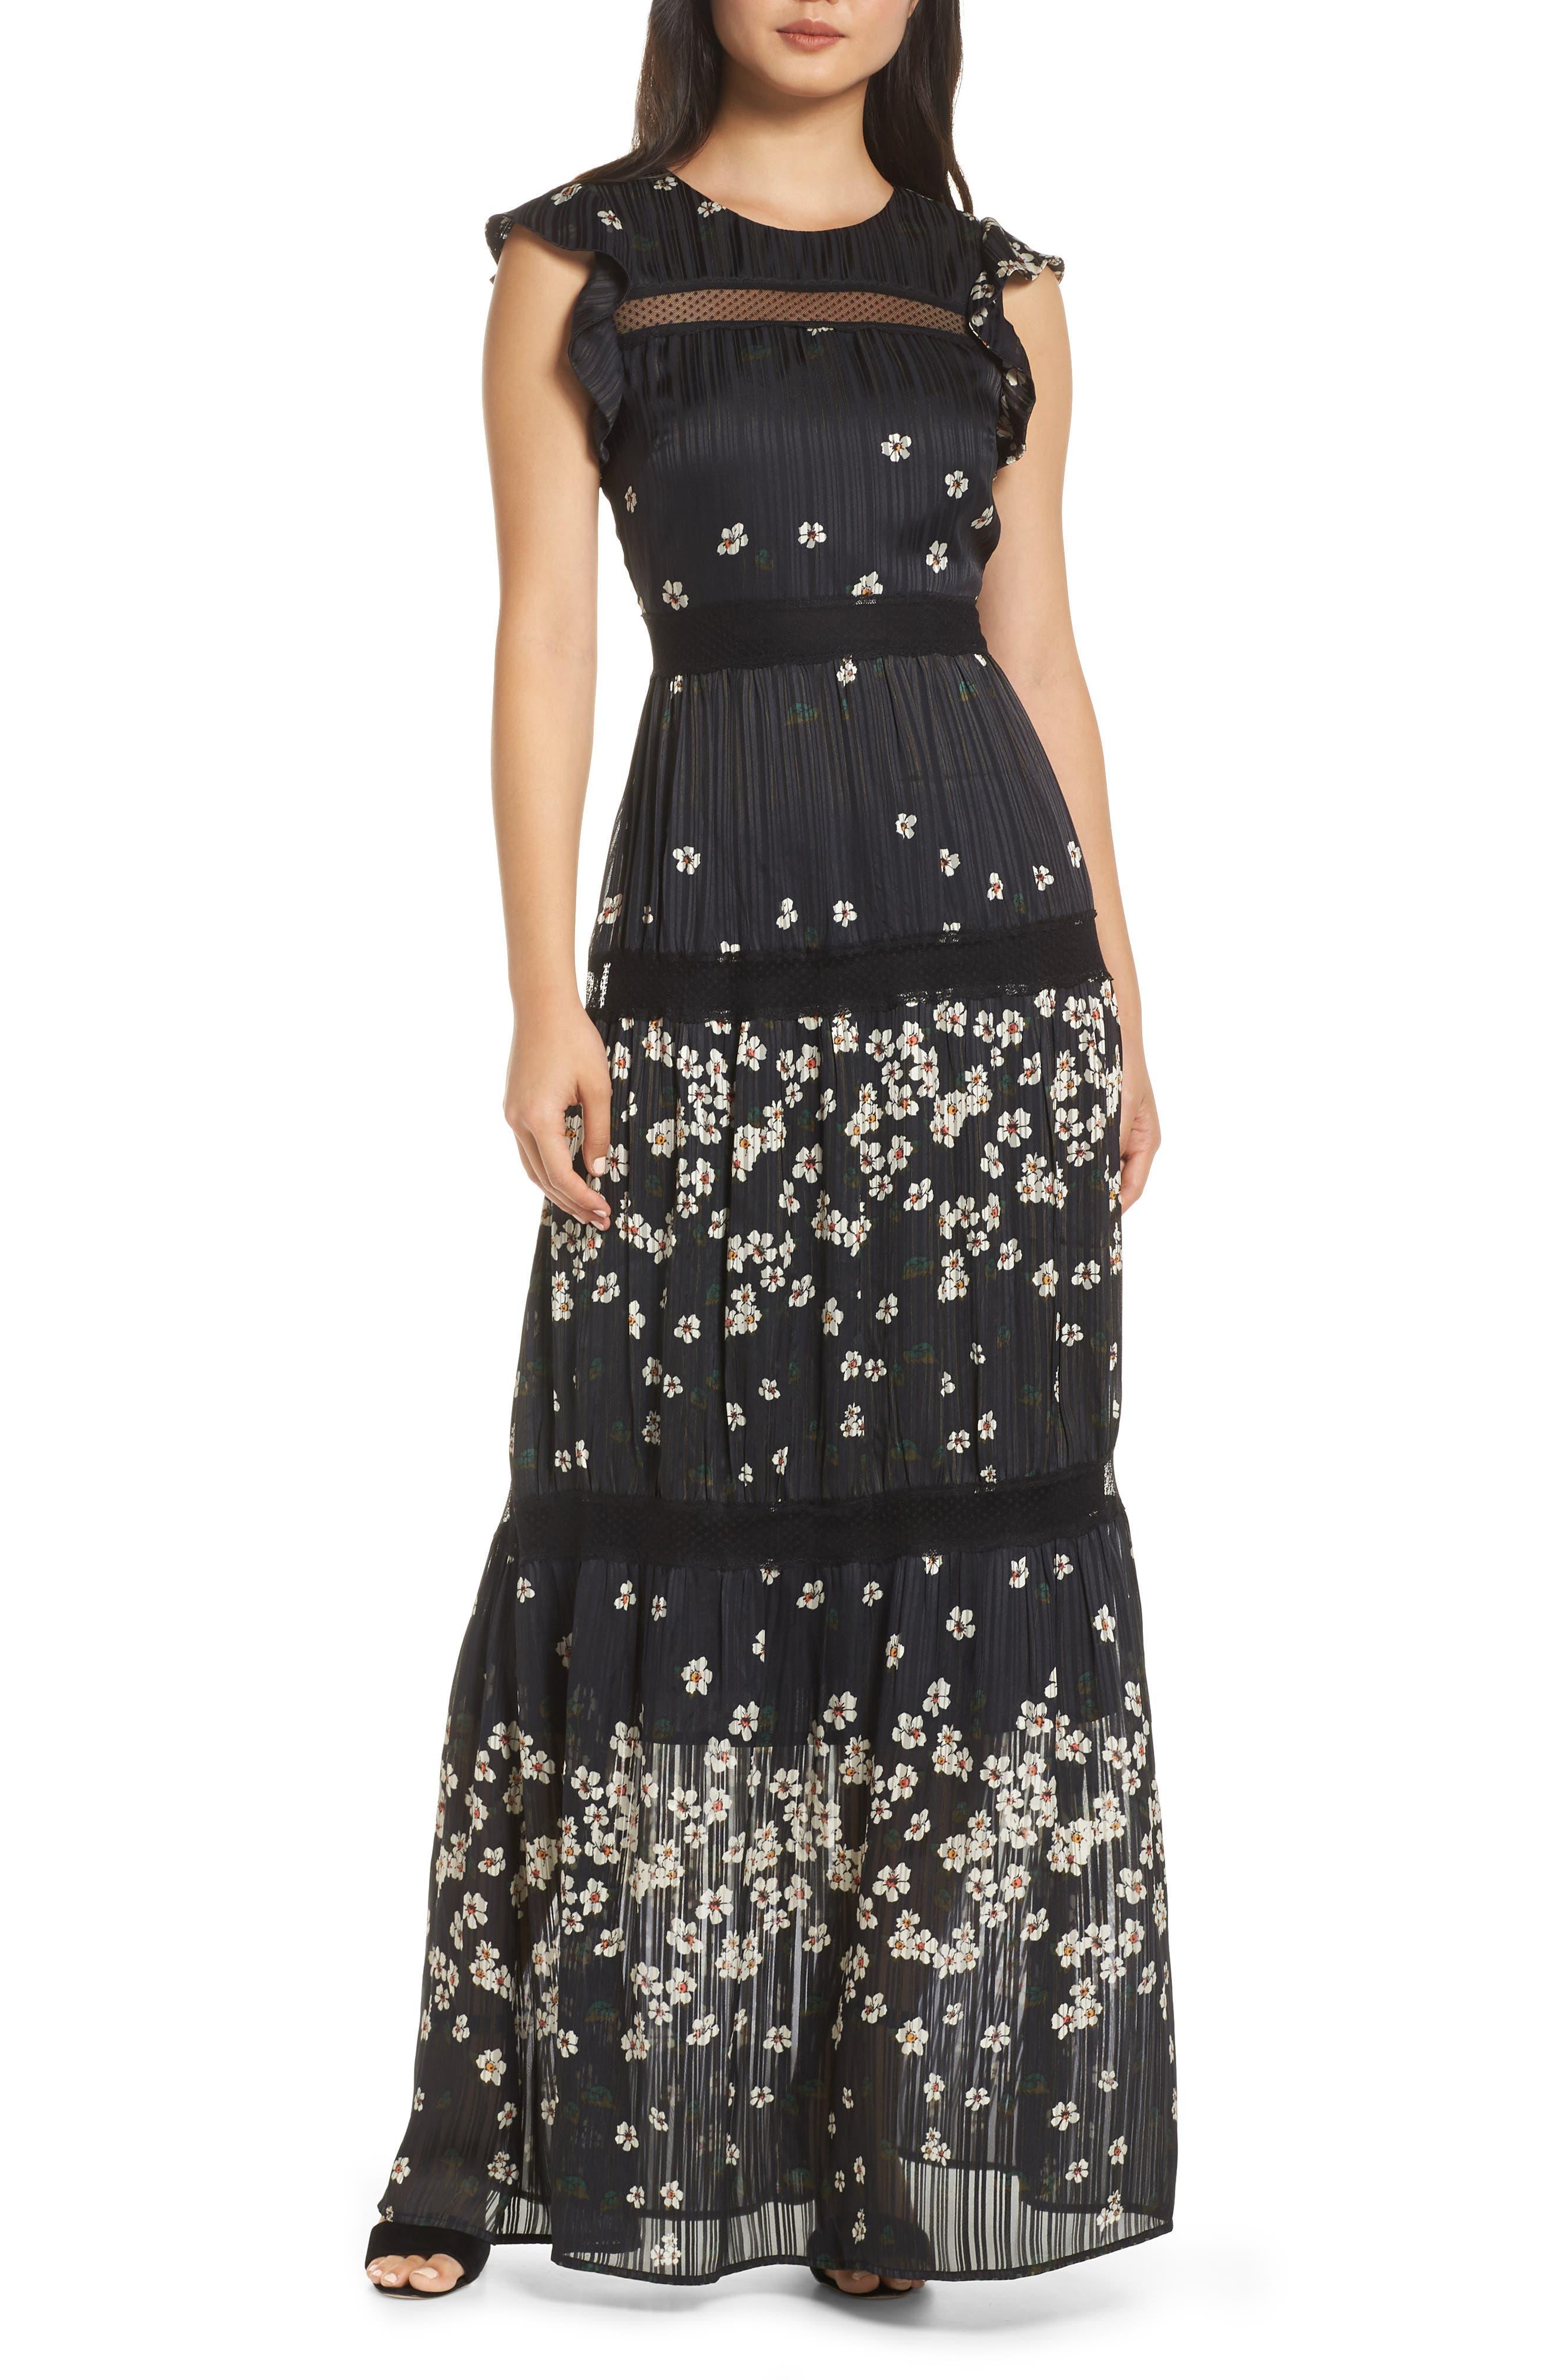 ADELYN RAE Suri Maxi Dress in Black-White